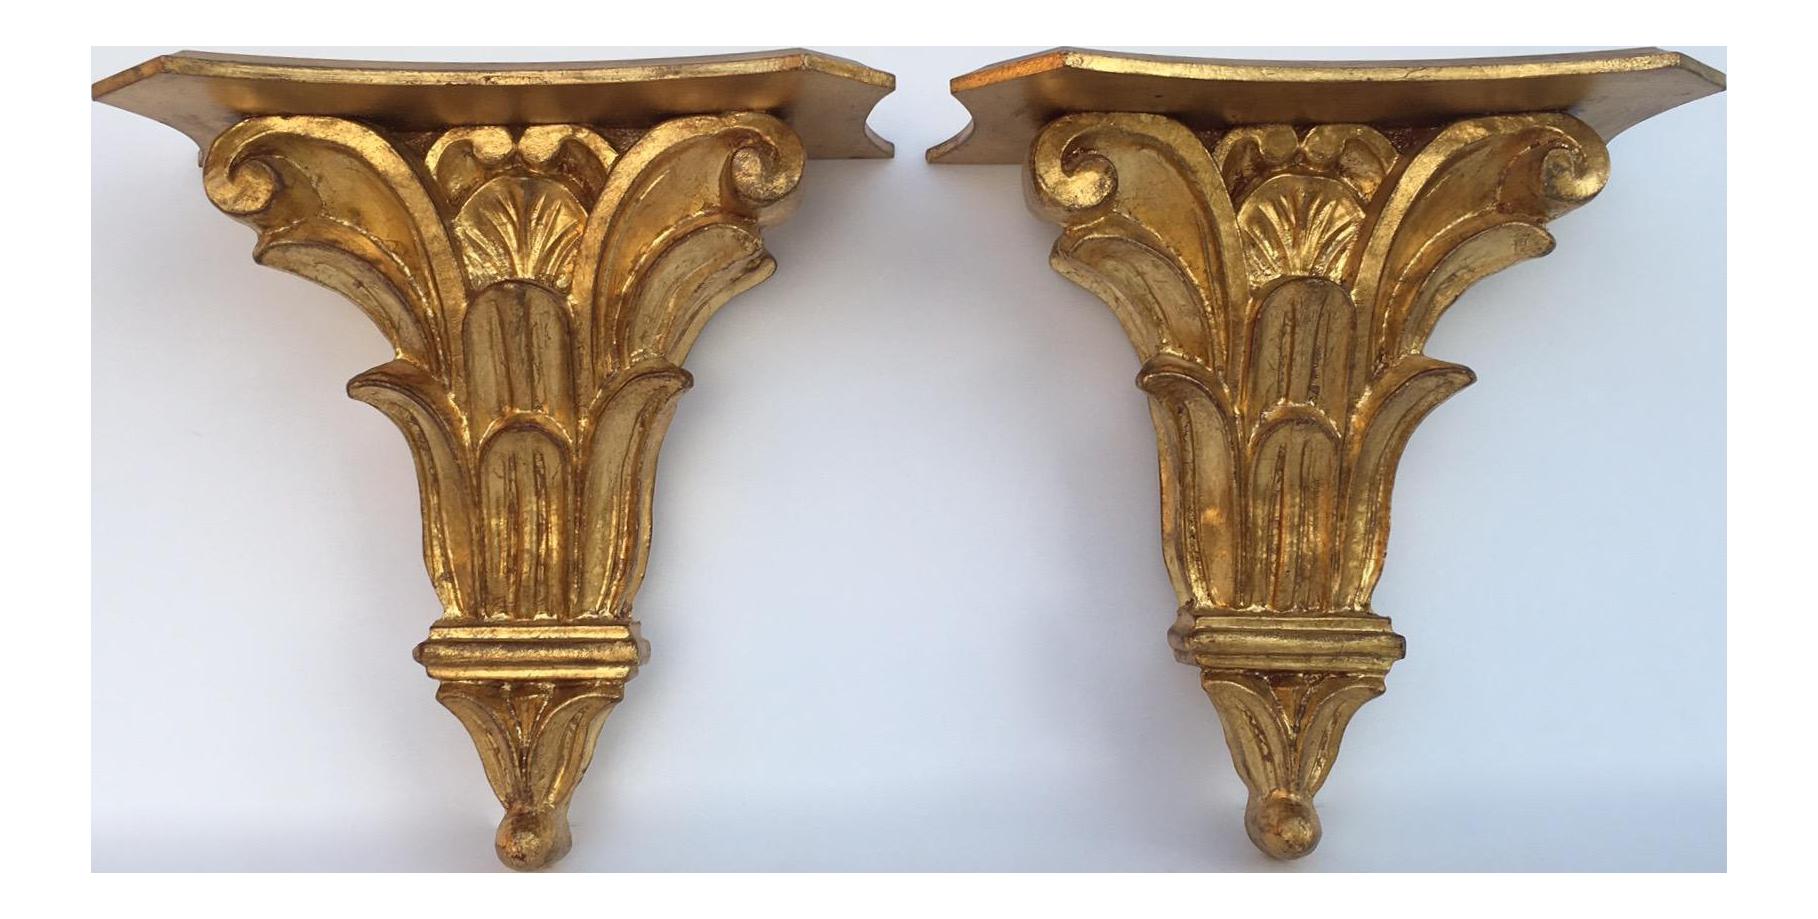 Charmant Vintage Italian Gilt Gold Leaf Carved Wall Brackets   A Pair